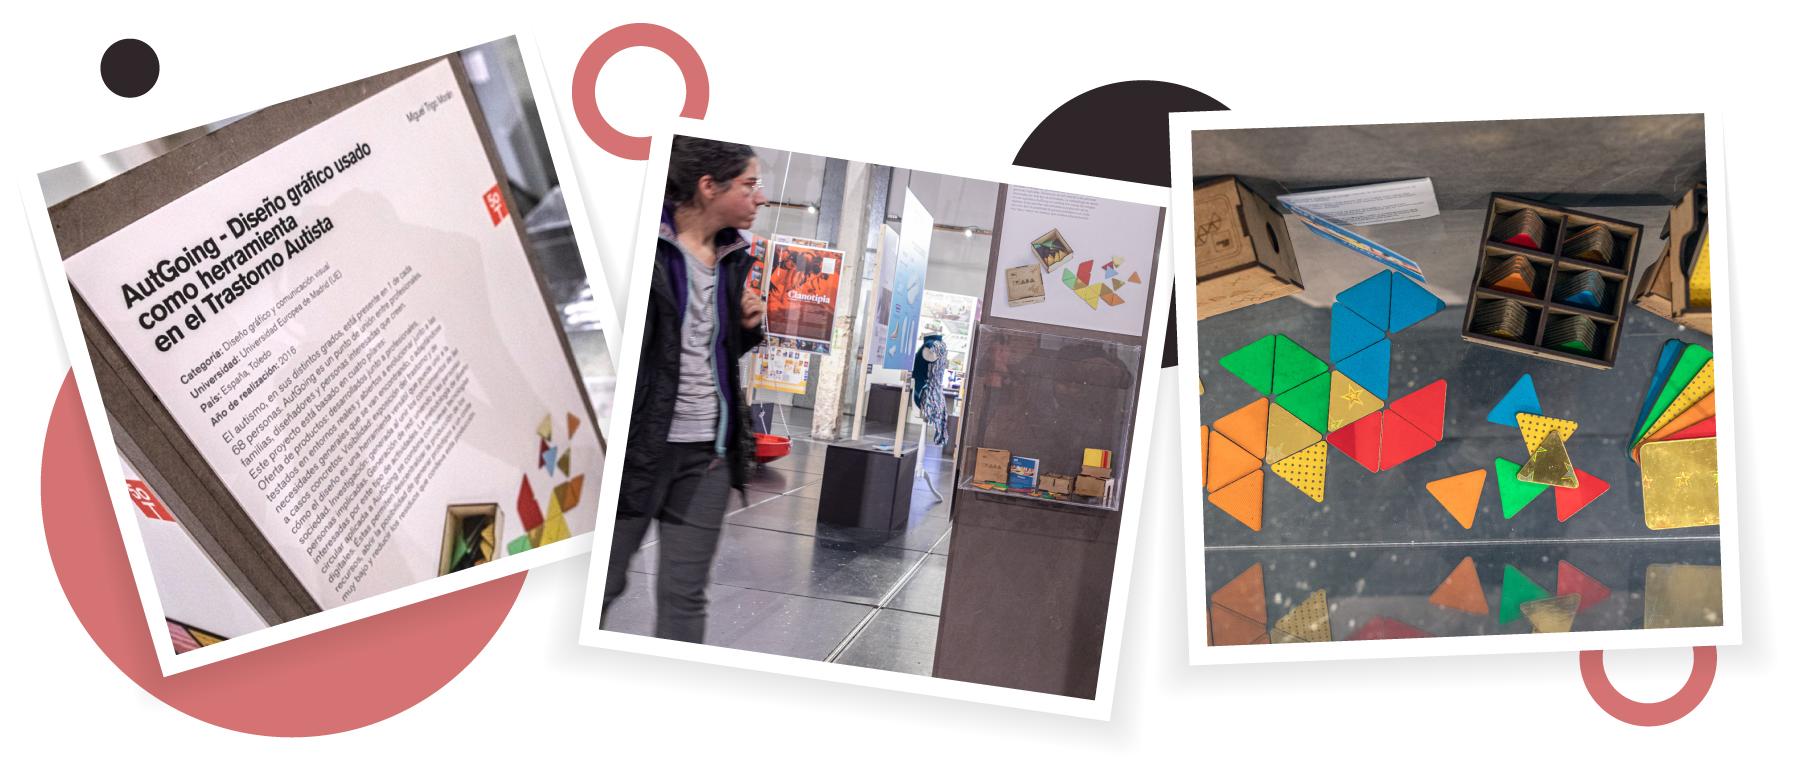 autgoing-dimad-8-bienal-iberoamericana-diseño-bid-dimad-50-talentos-2